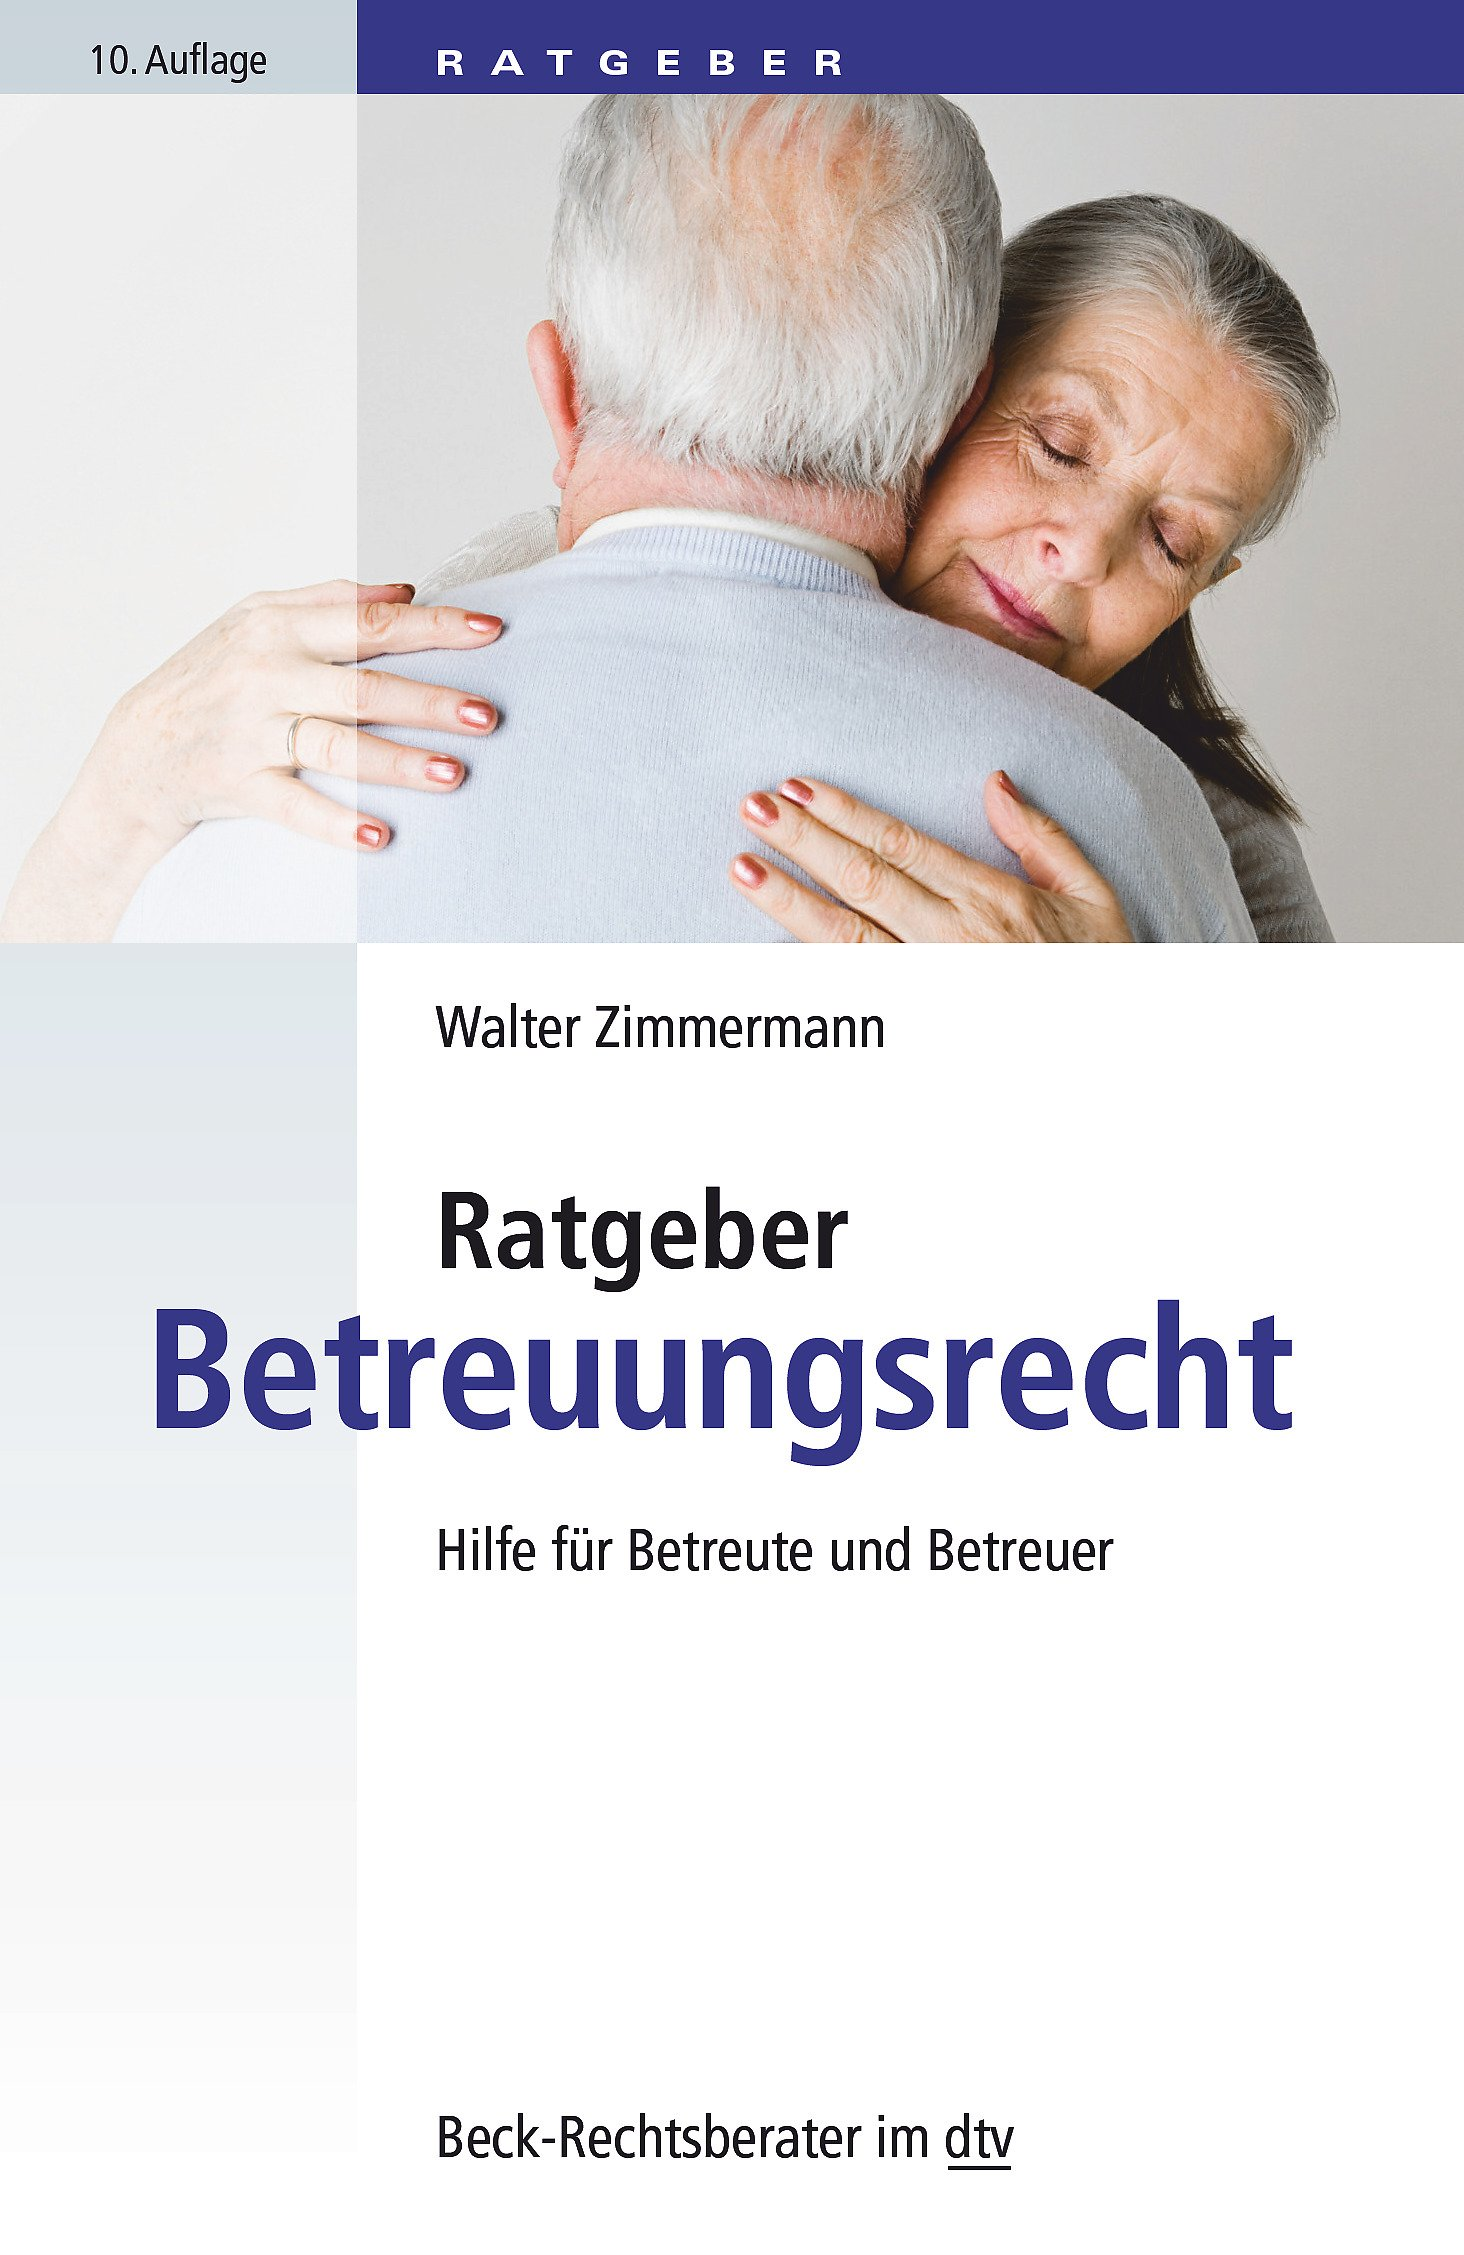 Ratgeber Betreuungsrecht: Hilfe für Betreute und Betreuer (dtv Beck Rechtsberater)